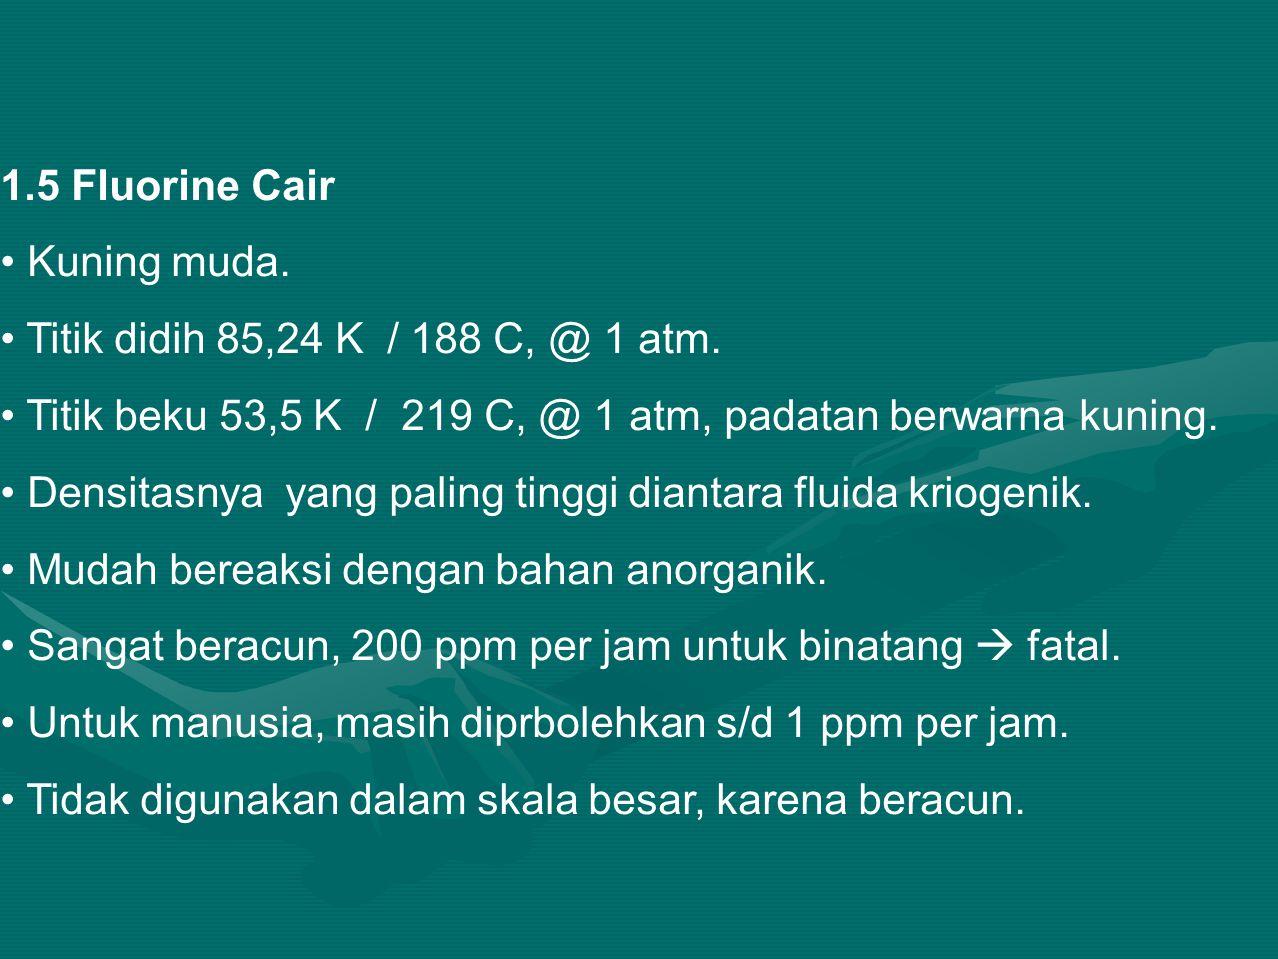 1.5 Fluorine Cair Kuning muda.Titik didih 85,24 K / 188 C, @ 1 atm.